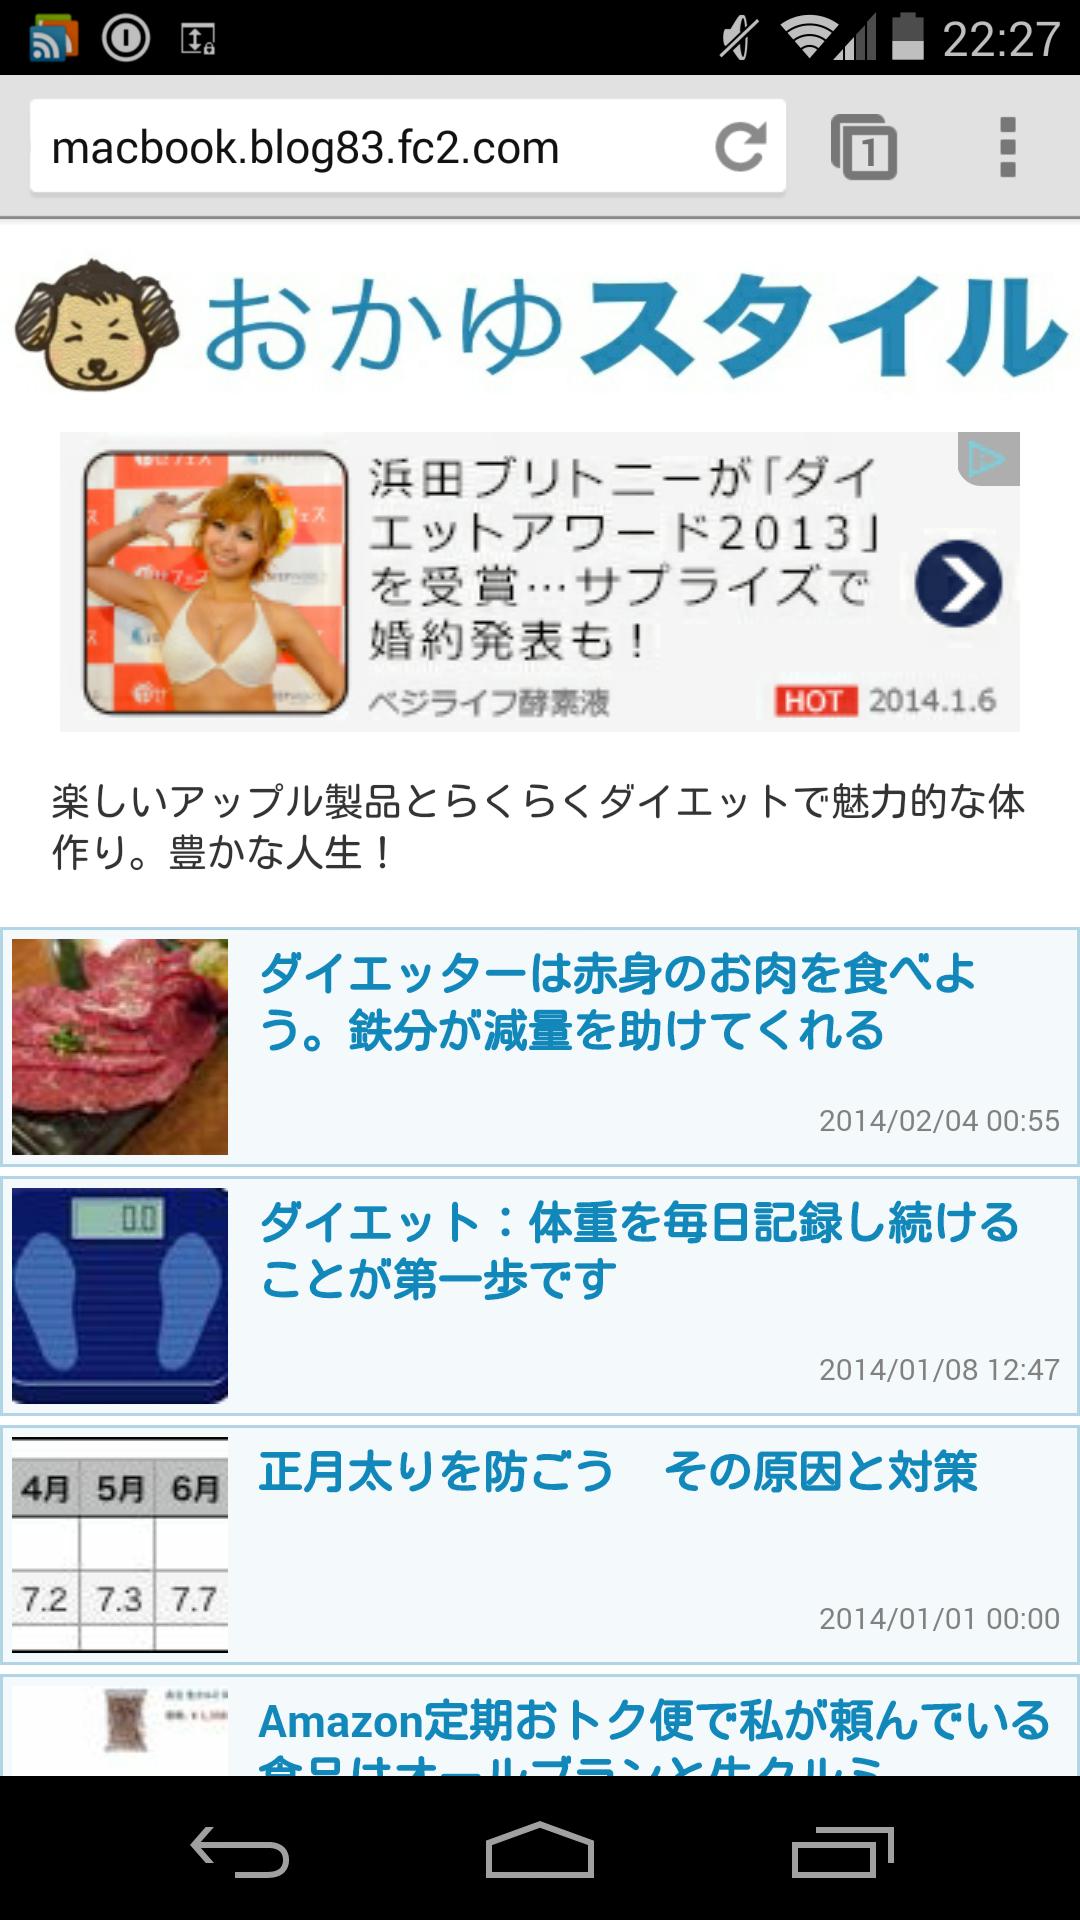 fc2ブログを始めたらまず設定しておきたい広告の …